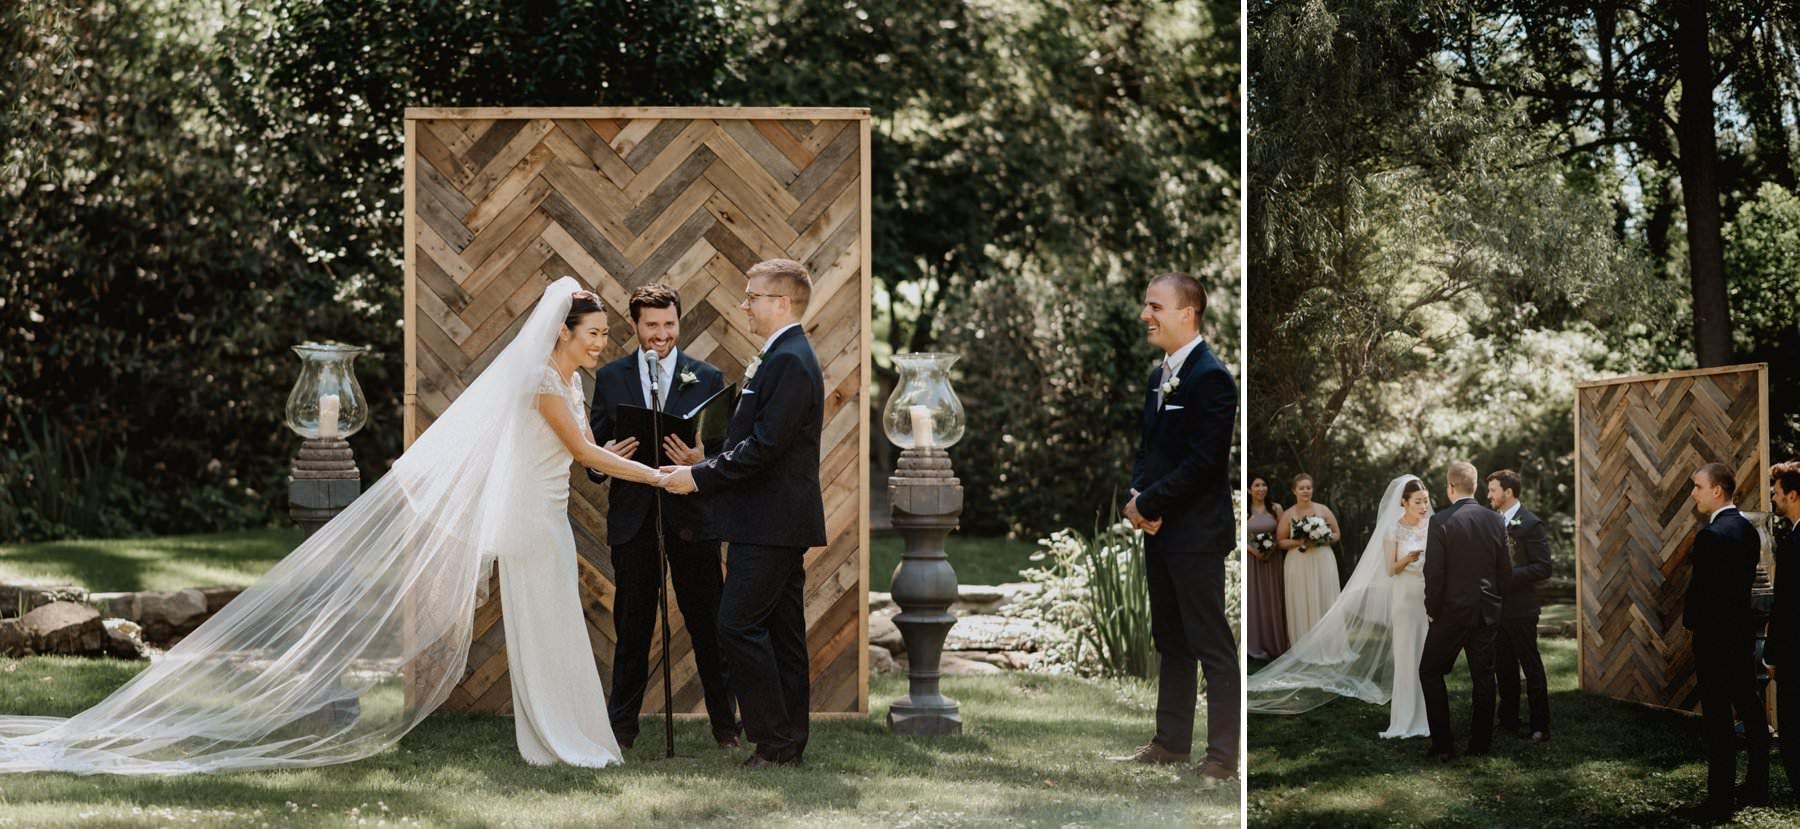 Appleford-estate-wedding-85.jpg